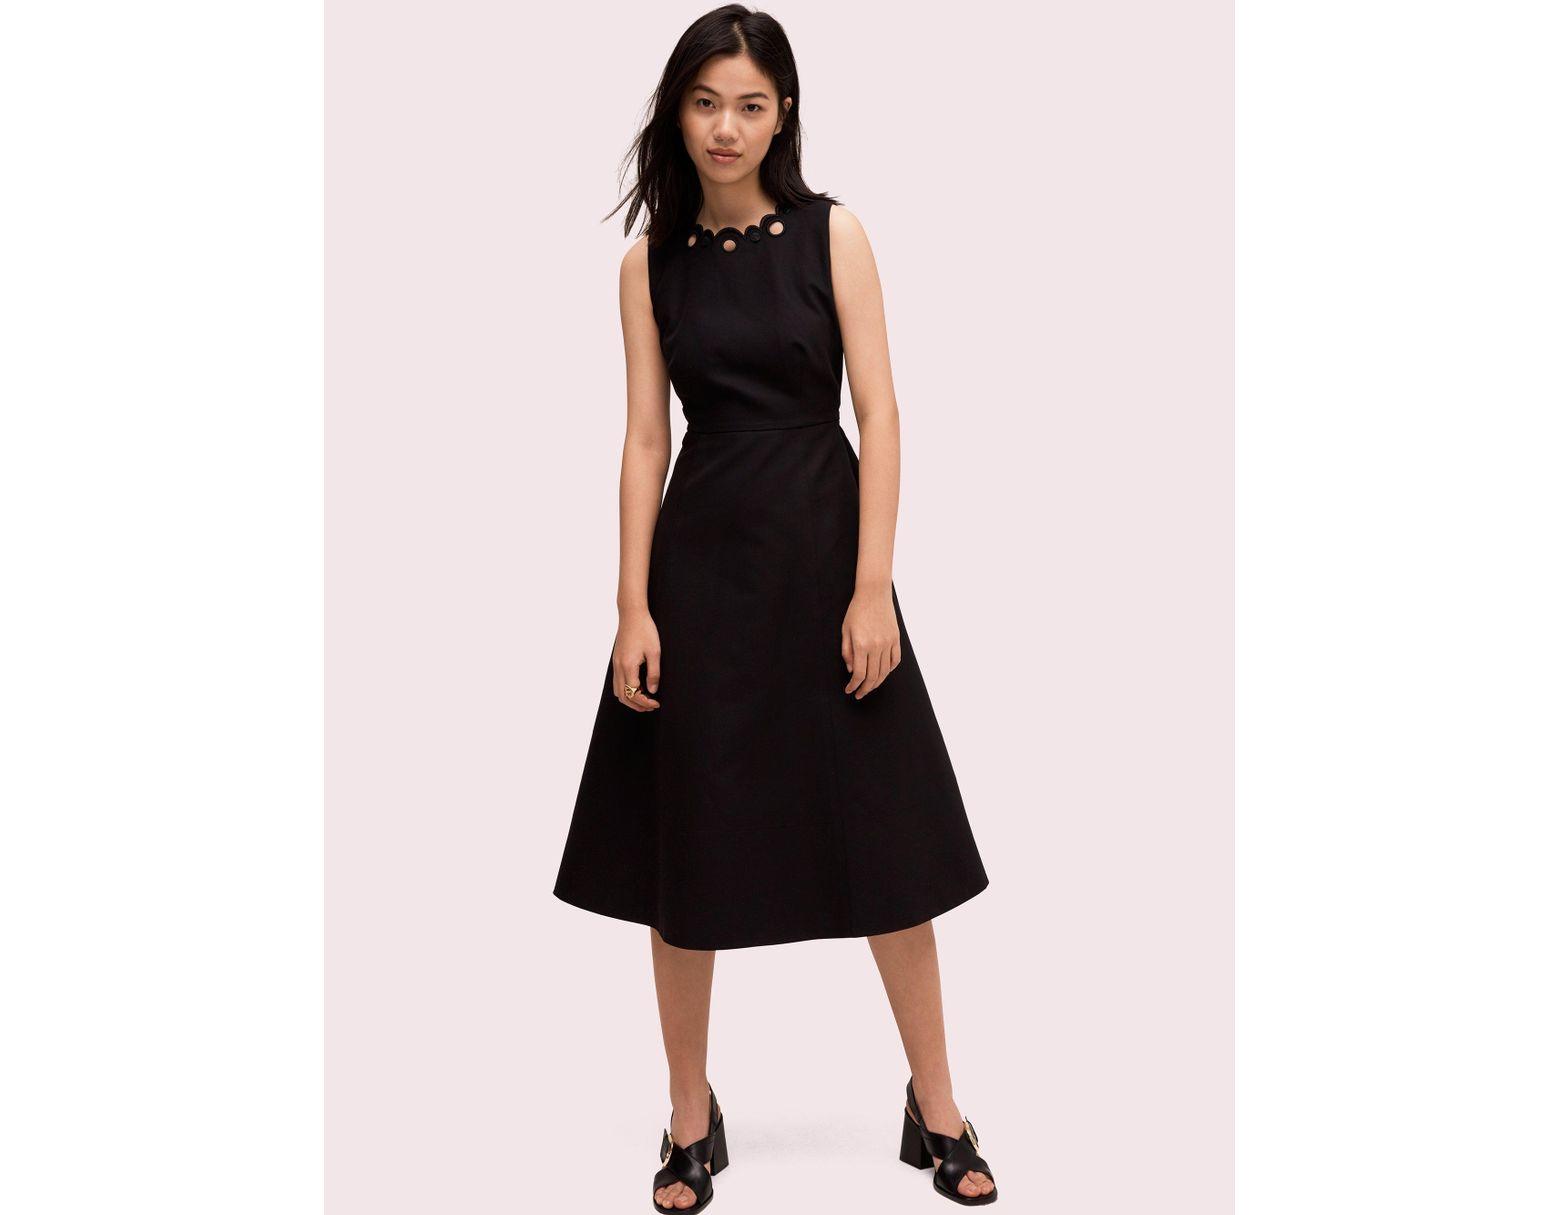 a48209f3d81 Kate Spade Scallop Cutout Midi Dress in Black - Lyst